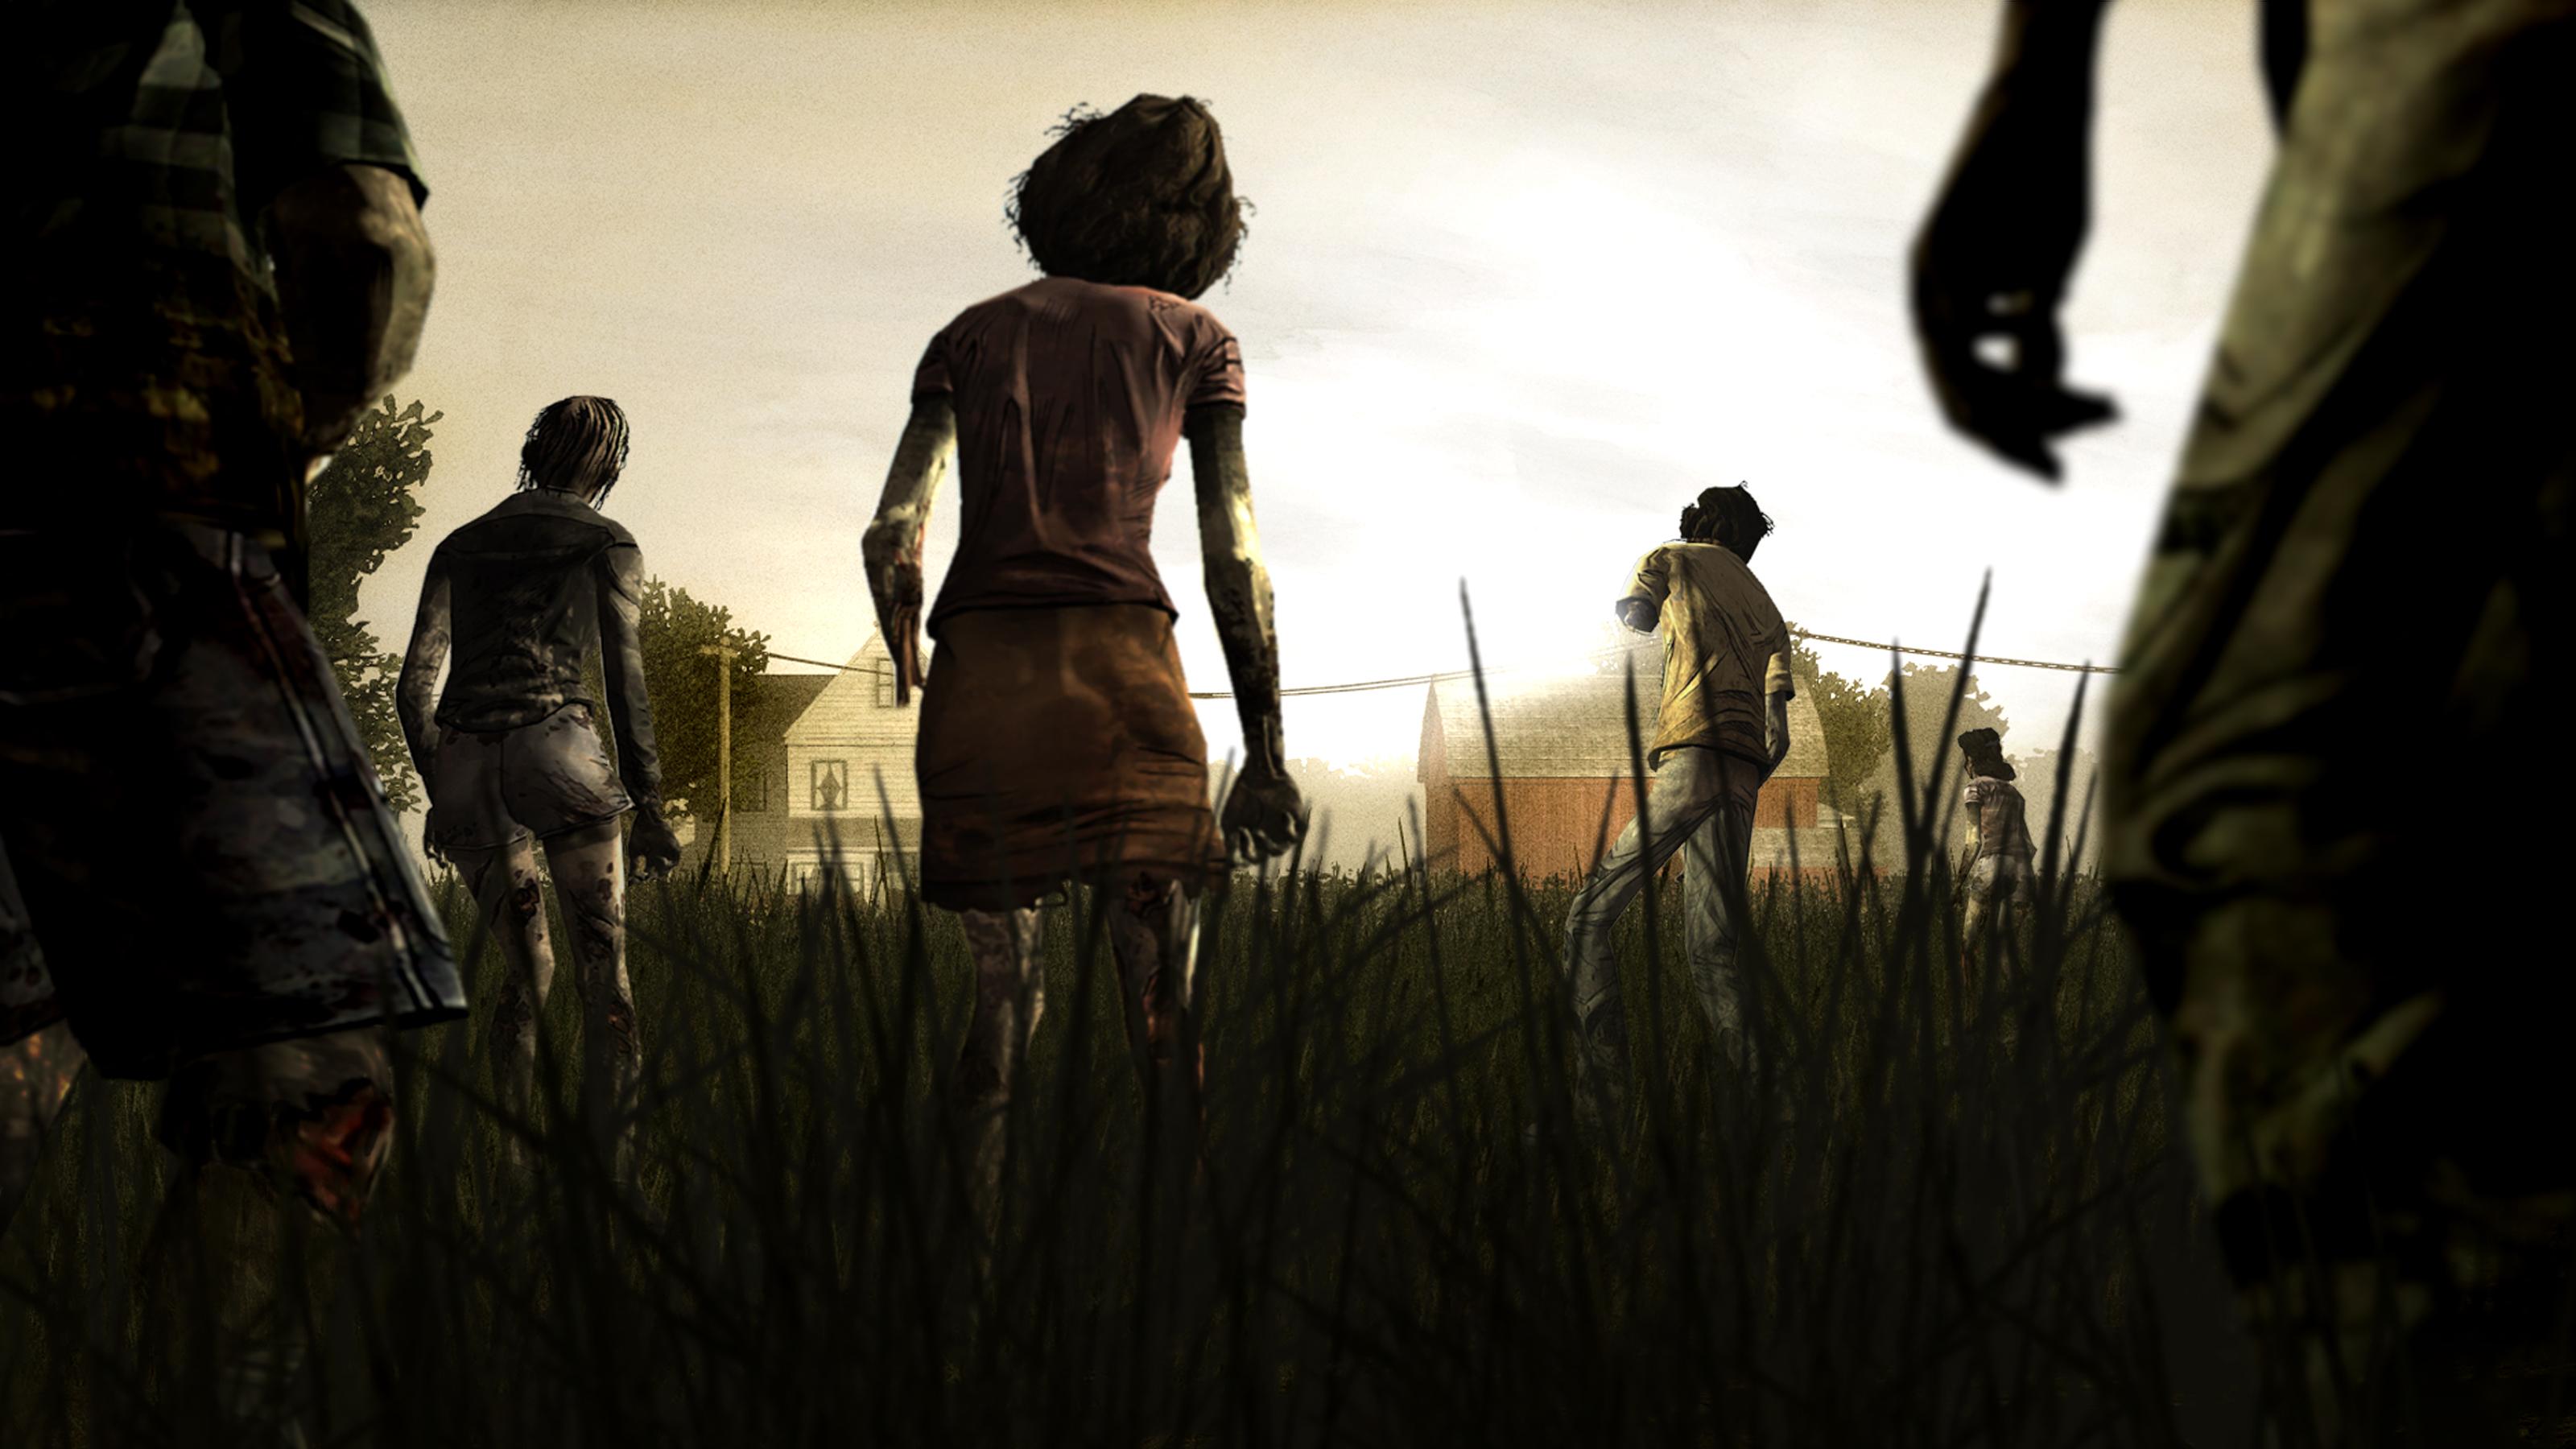 zombie The Walking Dead game wallpaper Wallpupcom 3200x1800